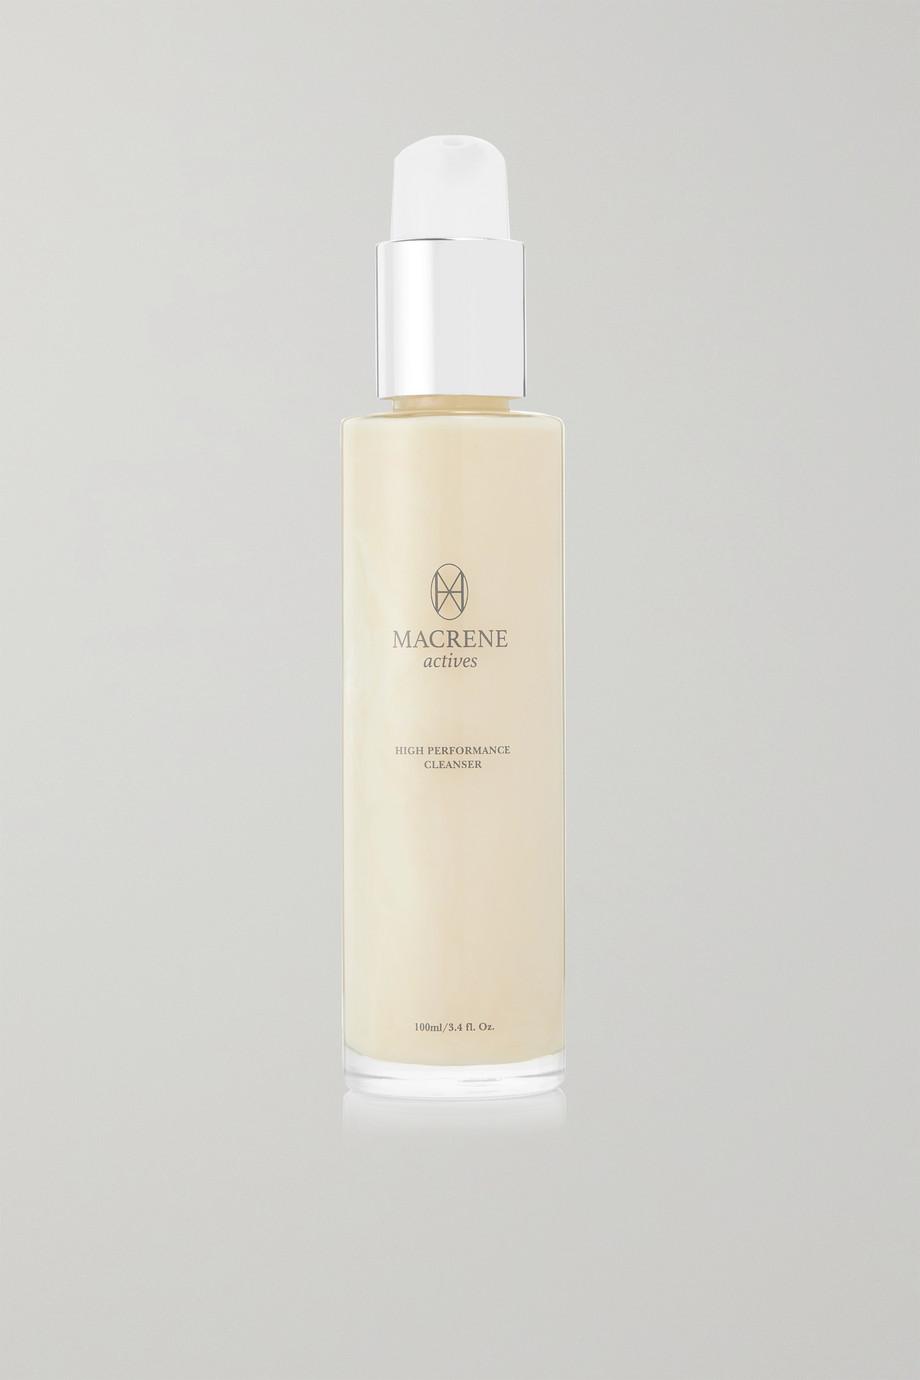 Macrene Actives High Performance Cleanser, 100 ml – Cleanser